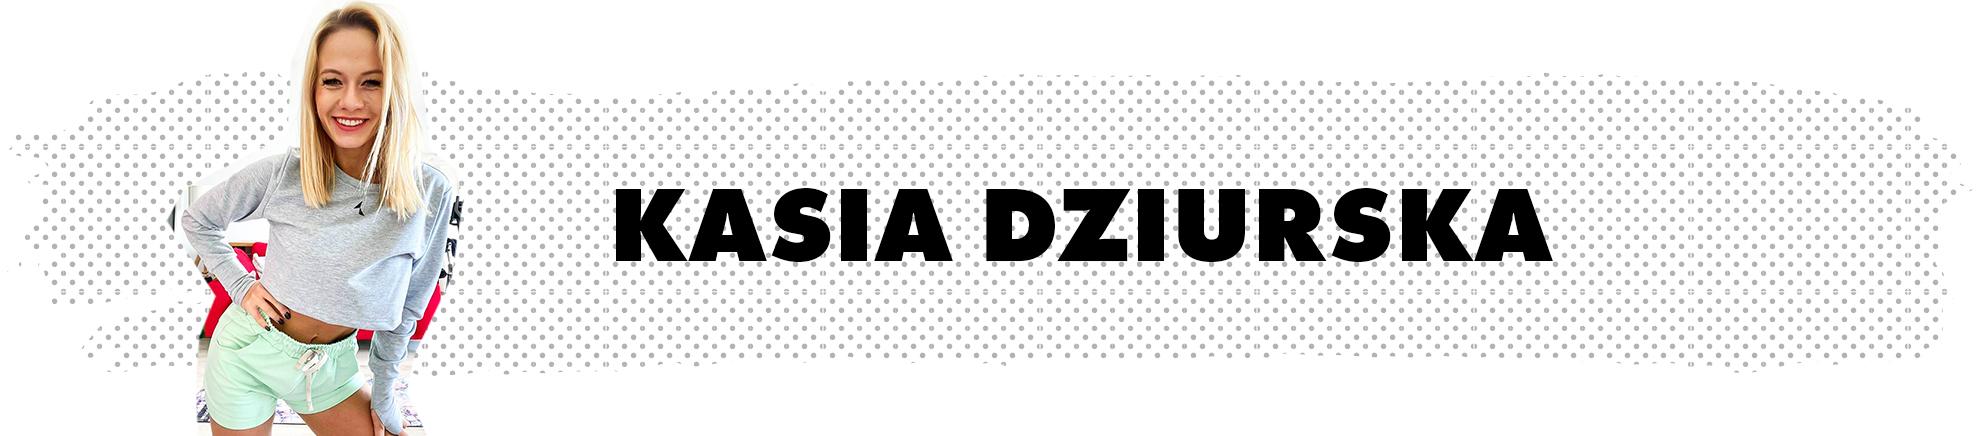 Kasia Dziurka - ambasadorka marki Carpatree